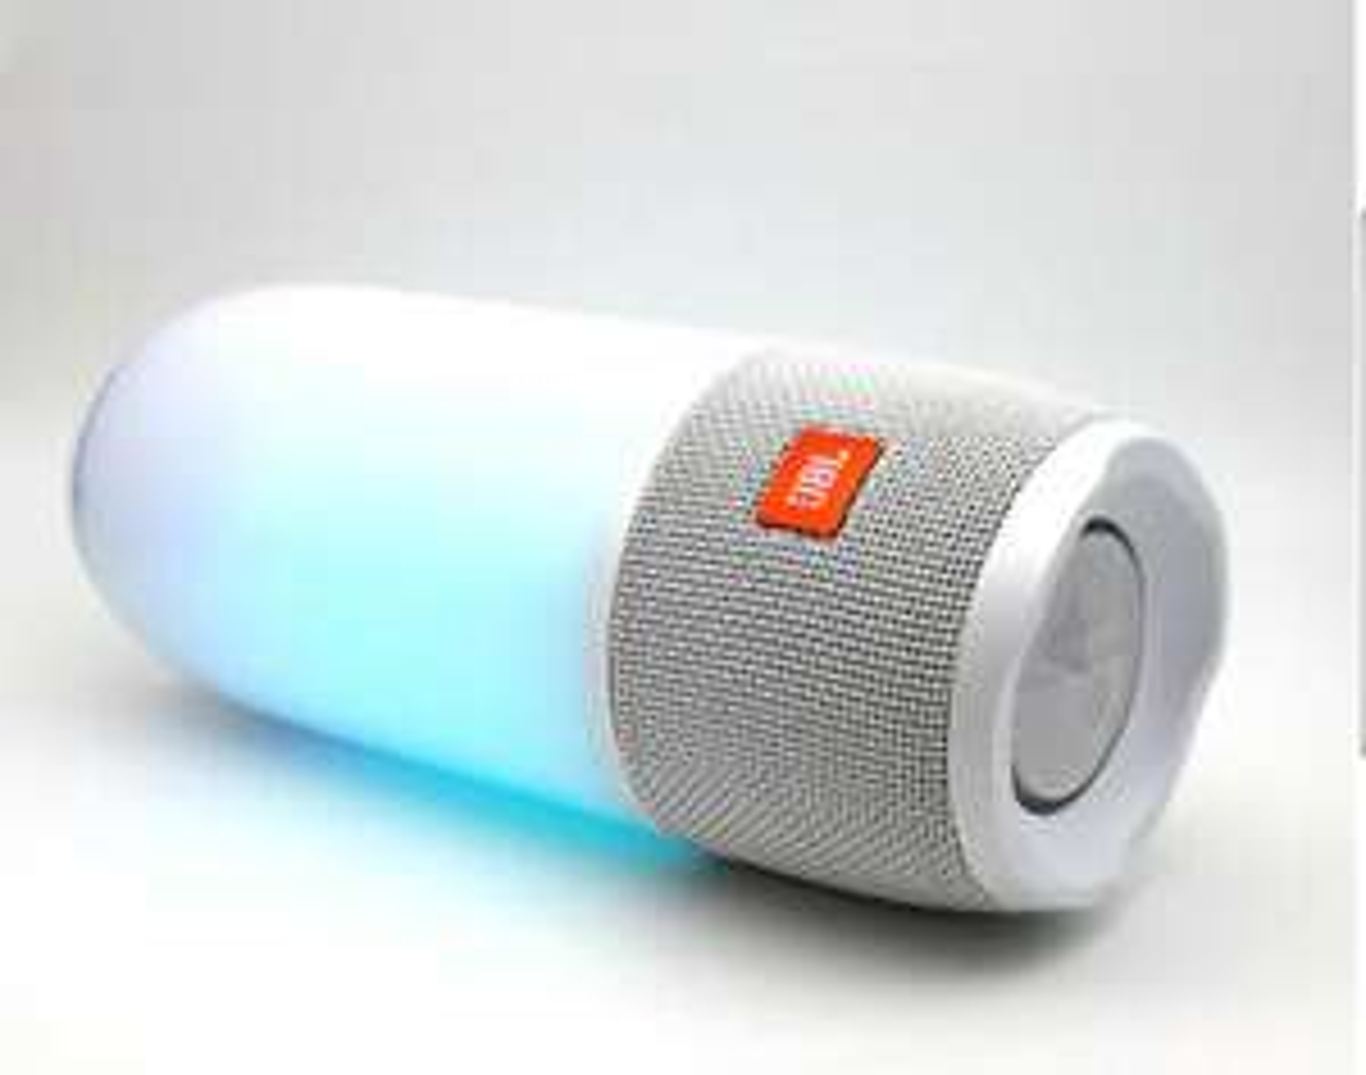 JBL Pulse 3 Mobiler Bluetooth Lautsprecher. Farbe weiß. Versandkostenfrei